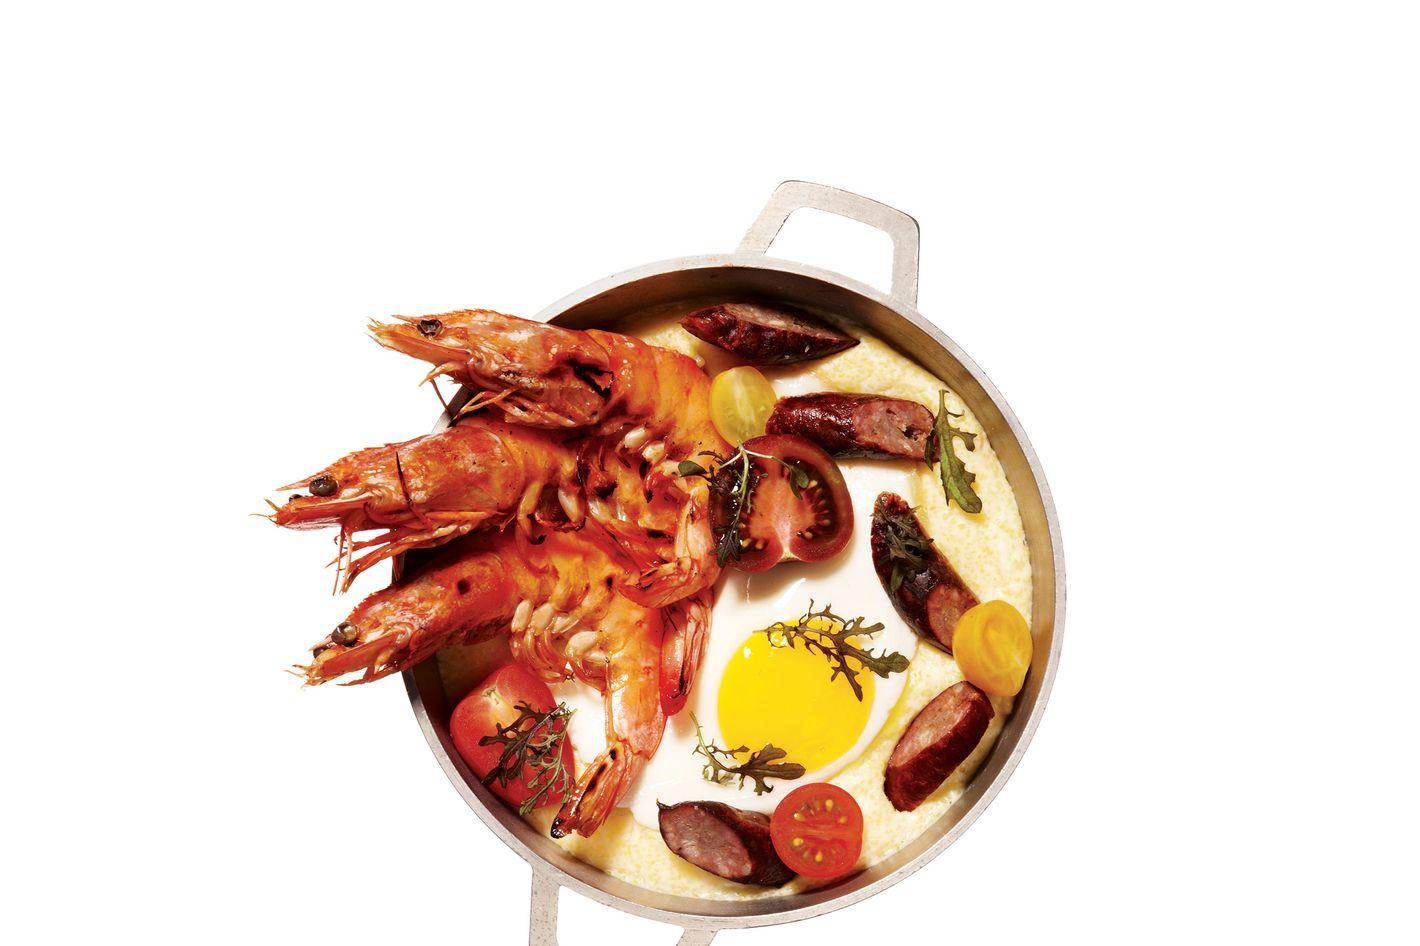 http://pixel.nymag.com/imgs/daily/grub/2013/02/22/22-shrimp-grits.jpg